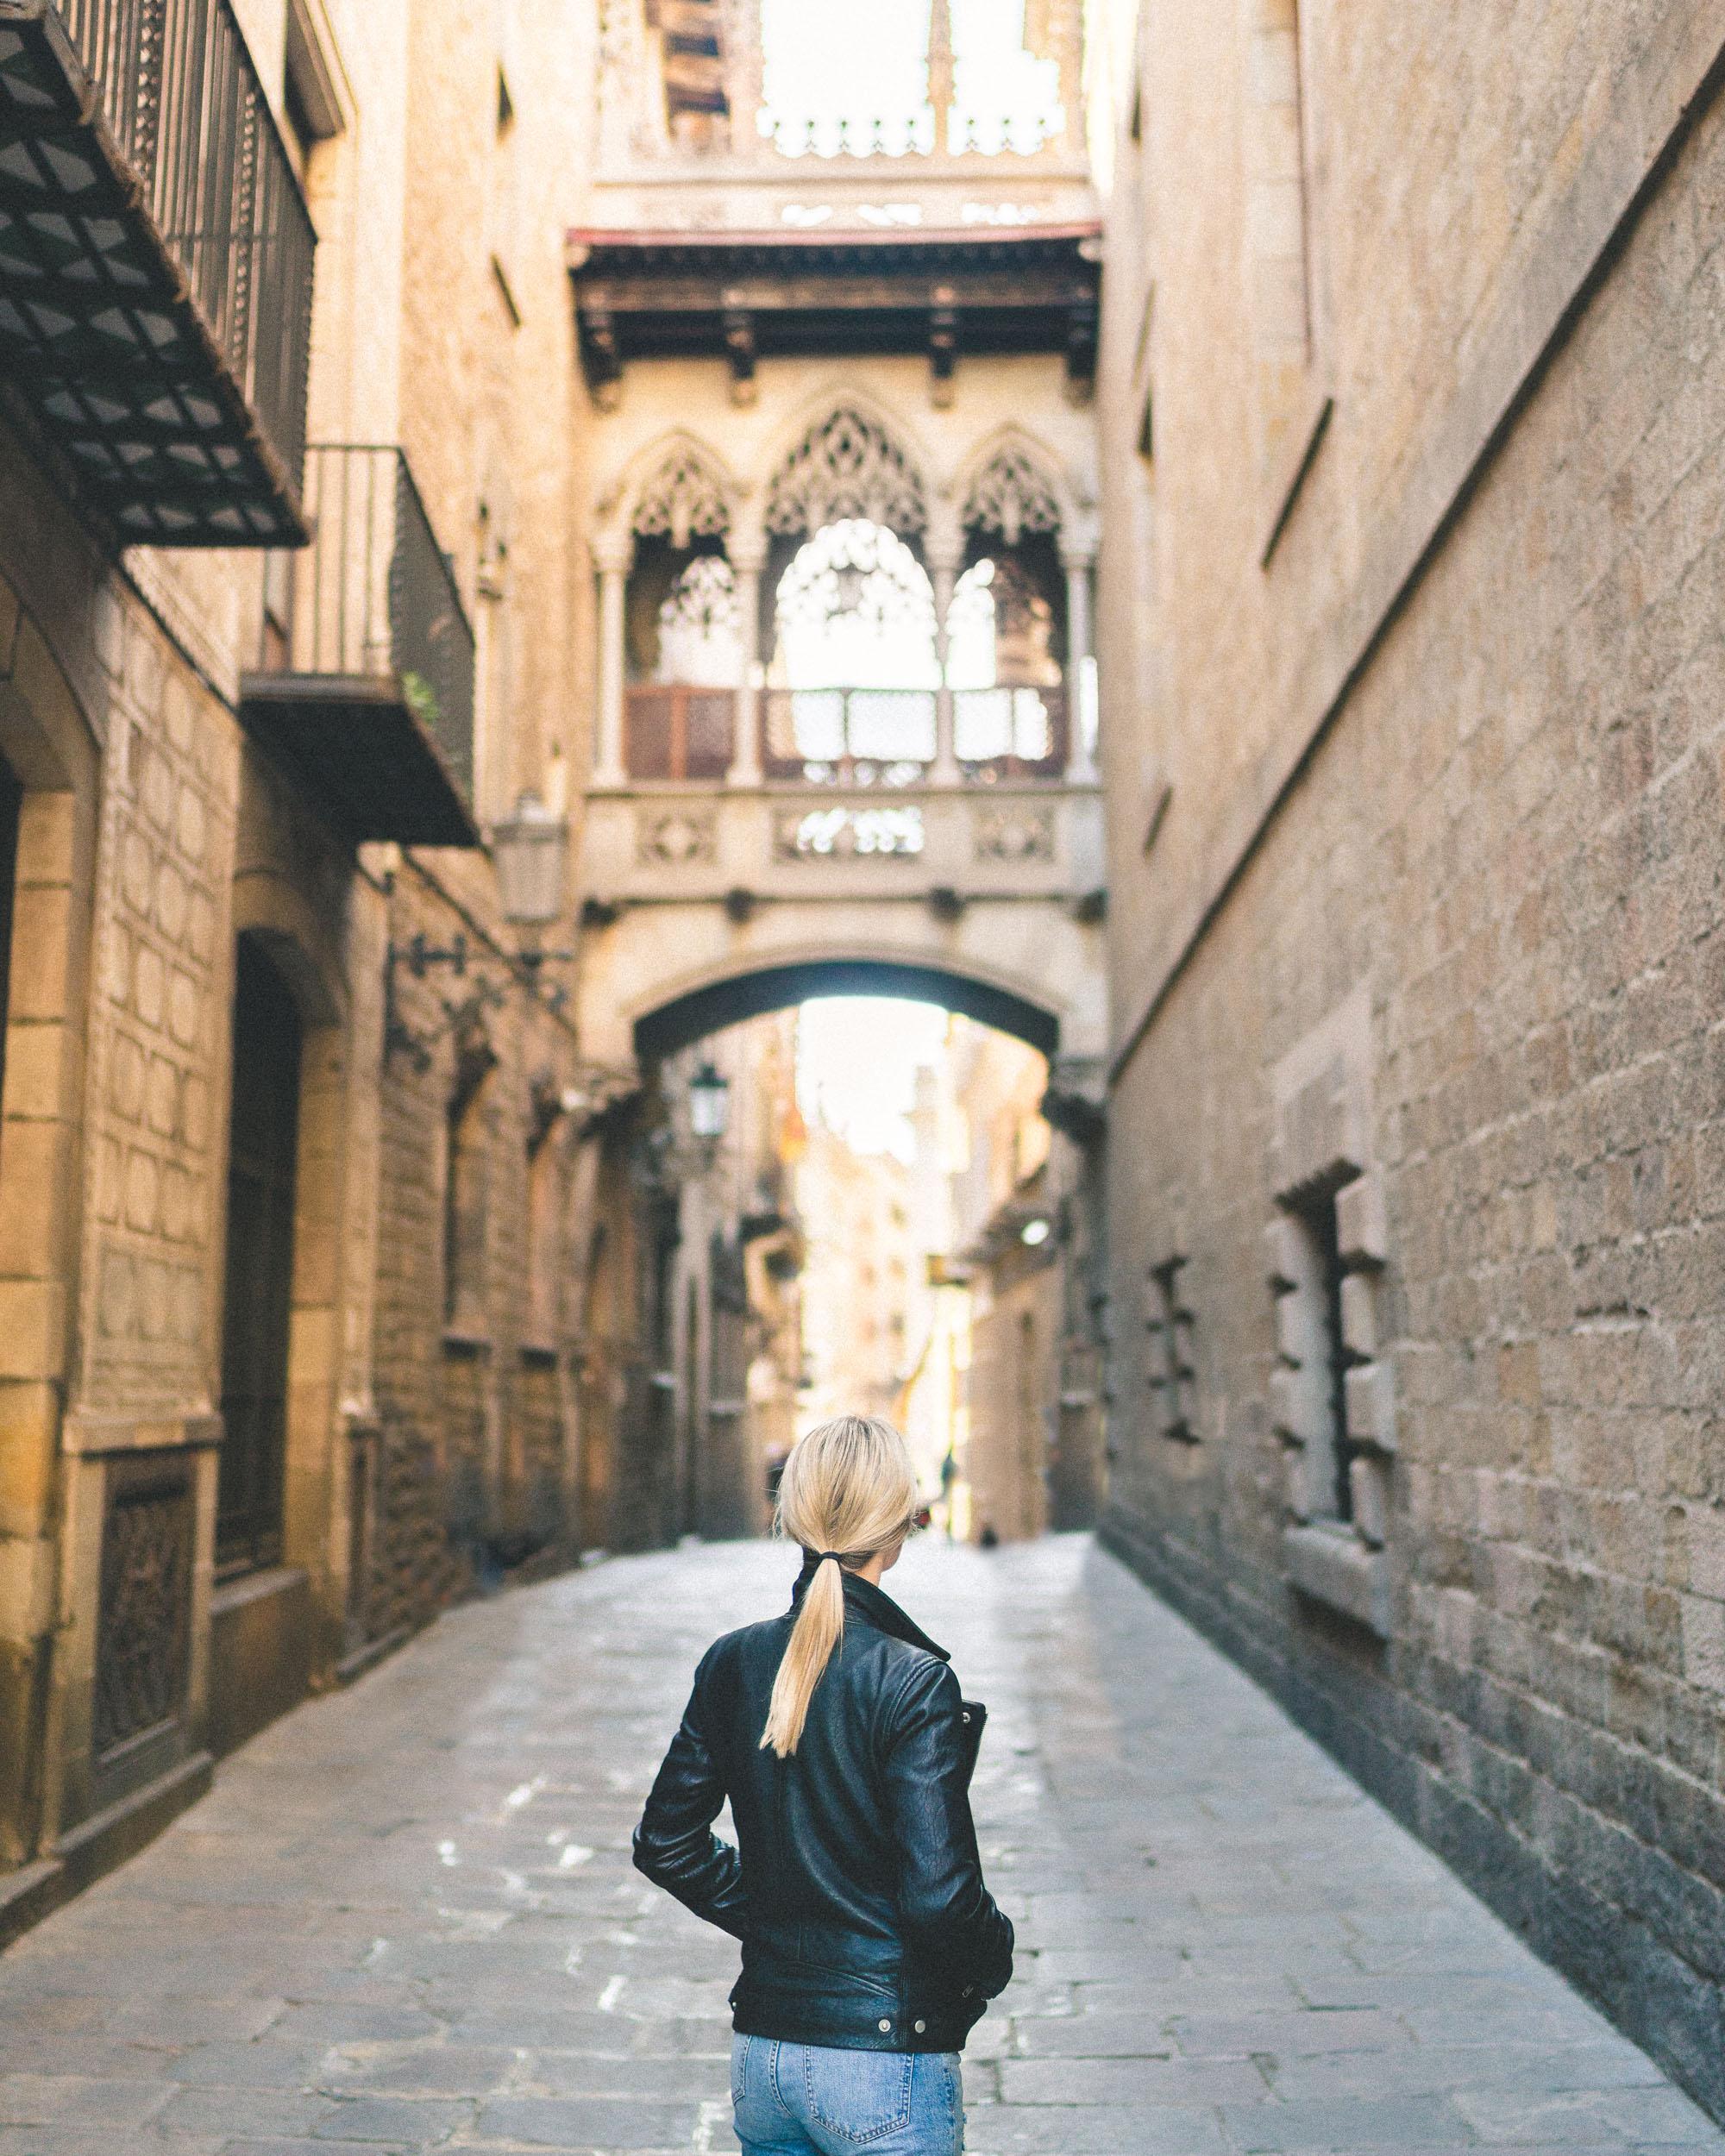 Pont del Bisbe bridge in the Old Gothic Quarter - Barcelona, Spain